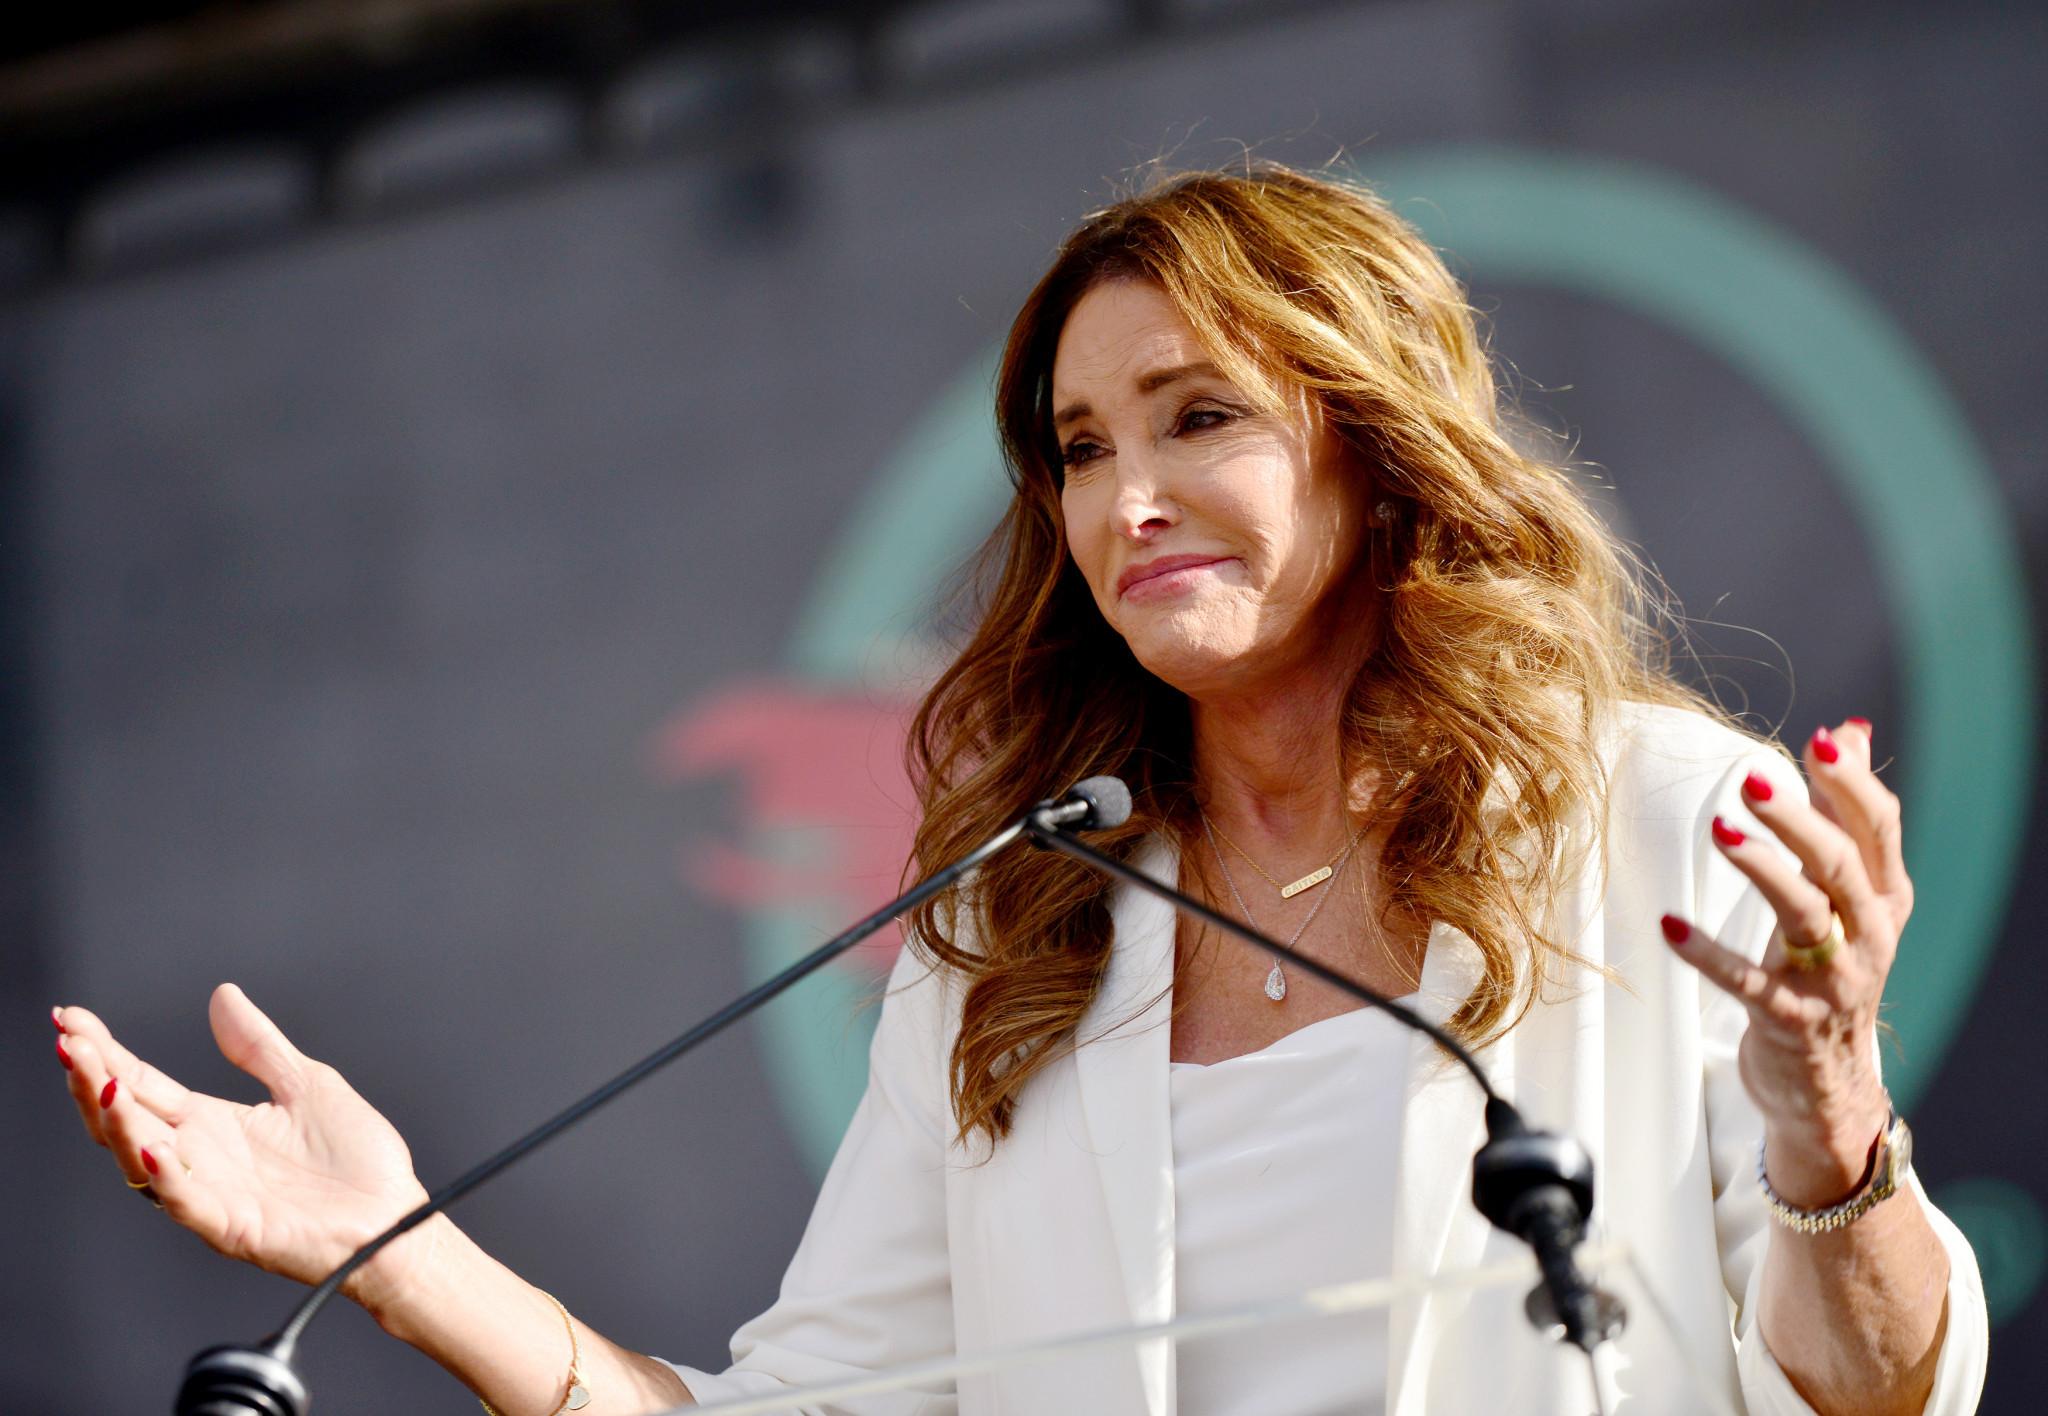 Olympic decathlon champion Jenner announces bid for California Governor